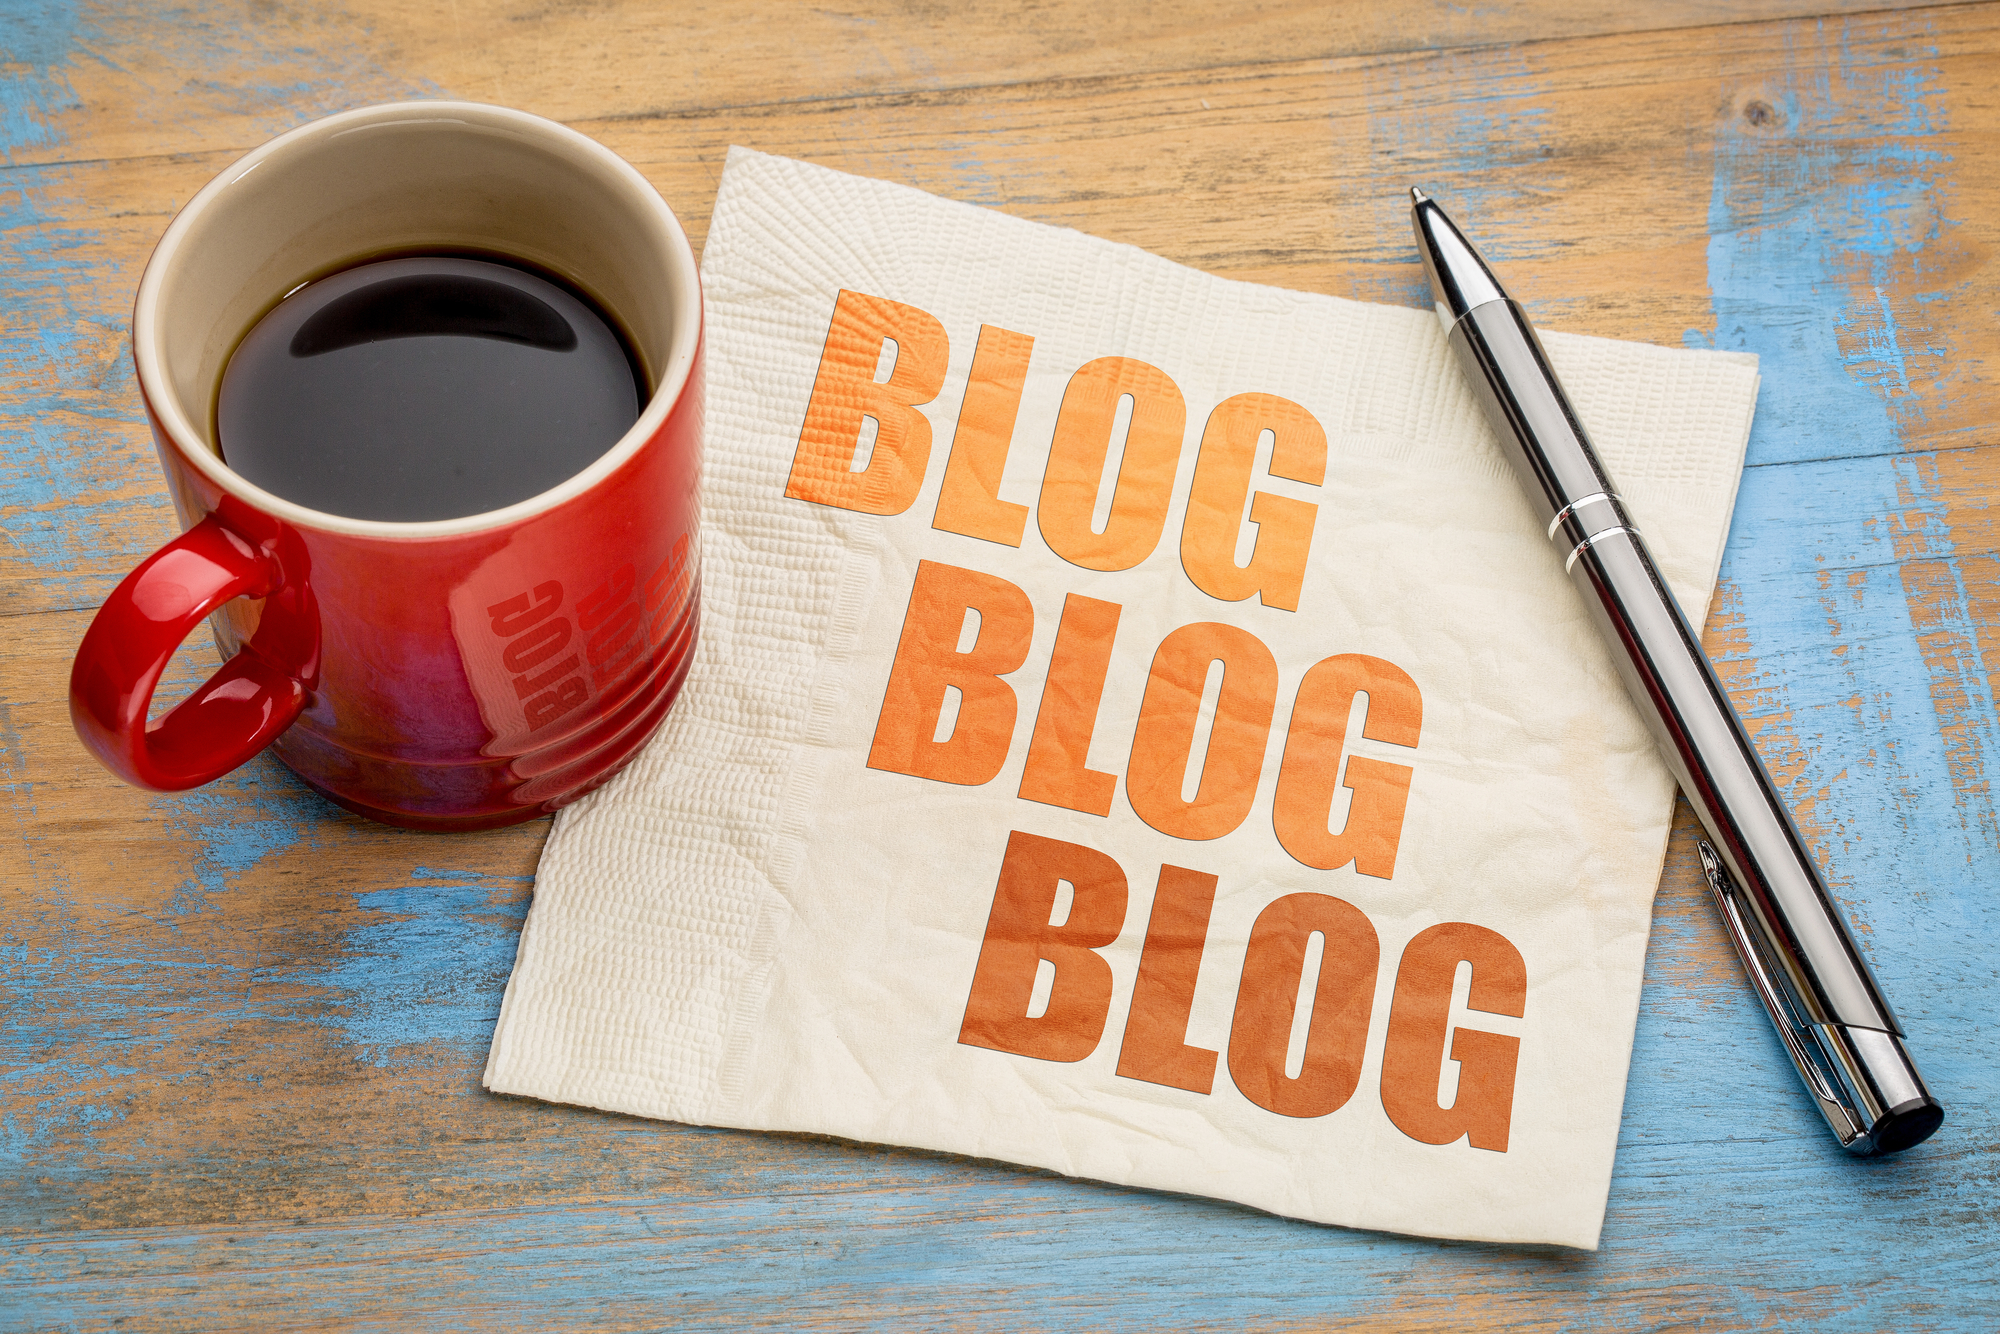 7 Ways to Improve Your Dental Blog – Part 1